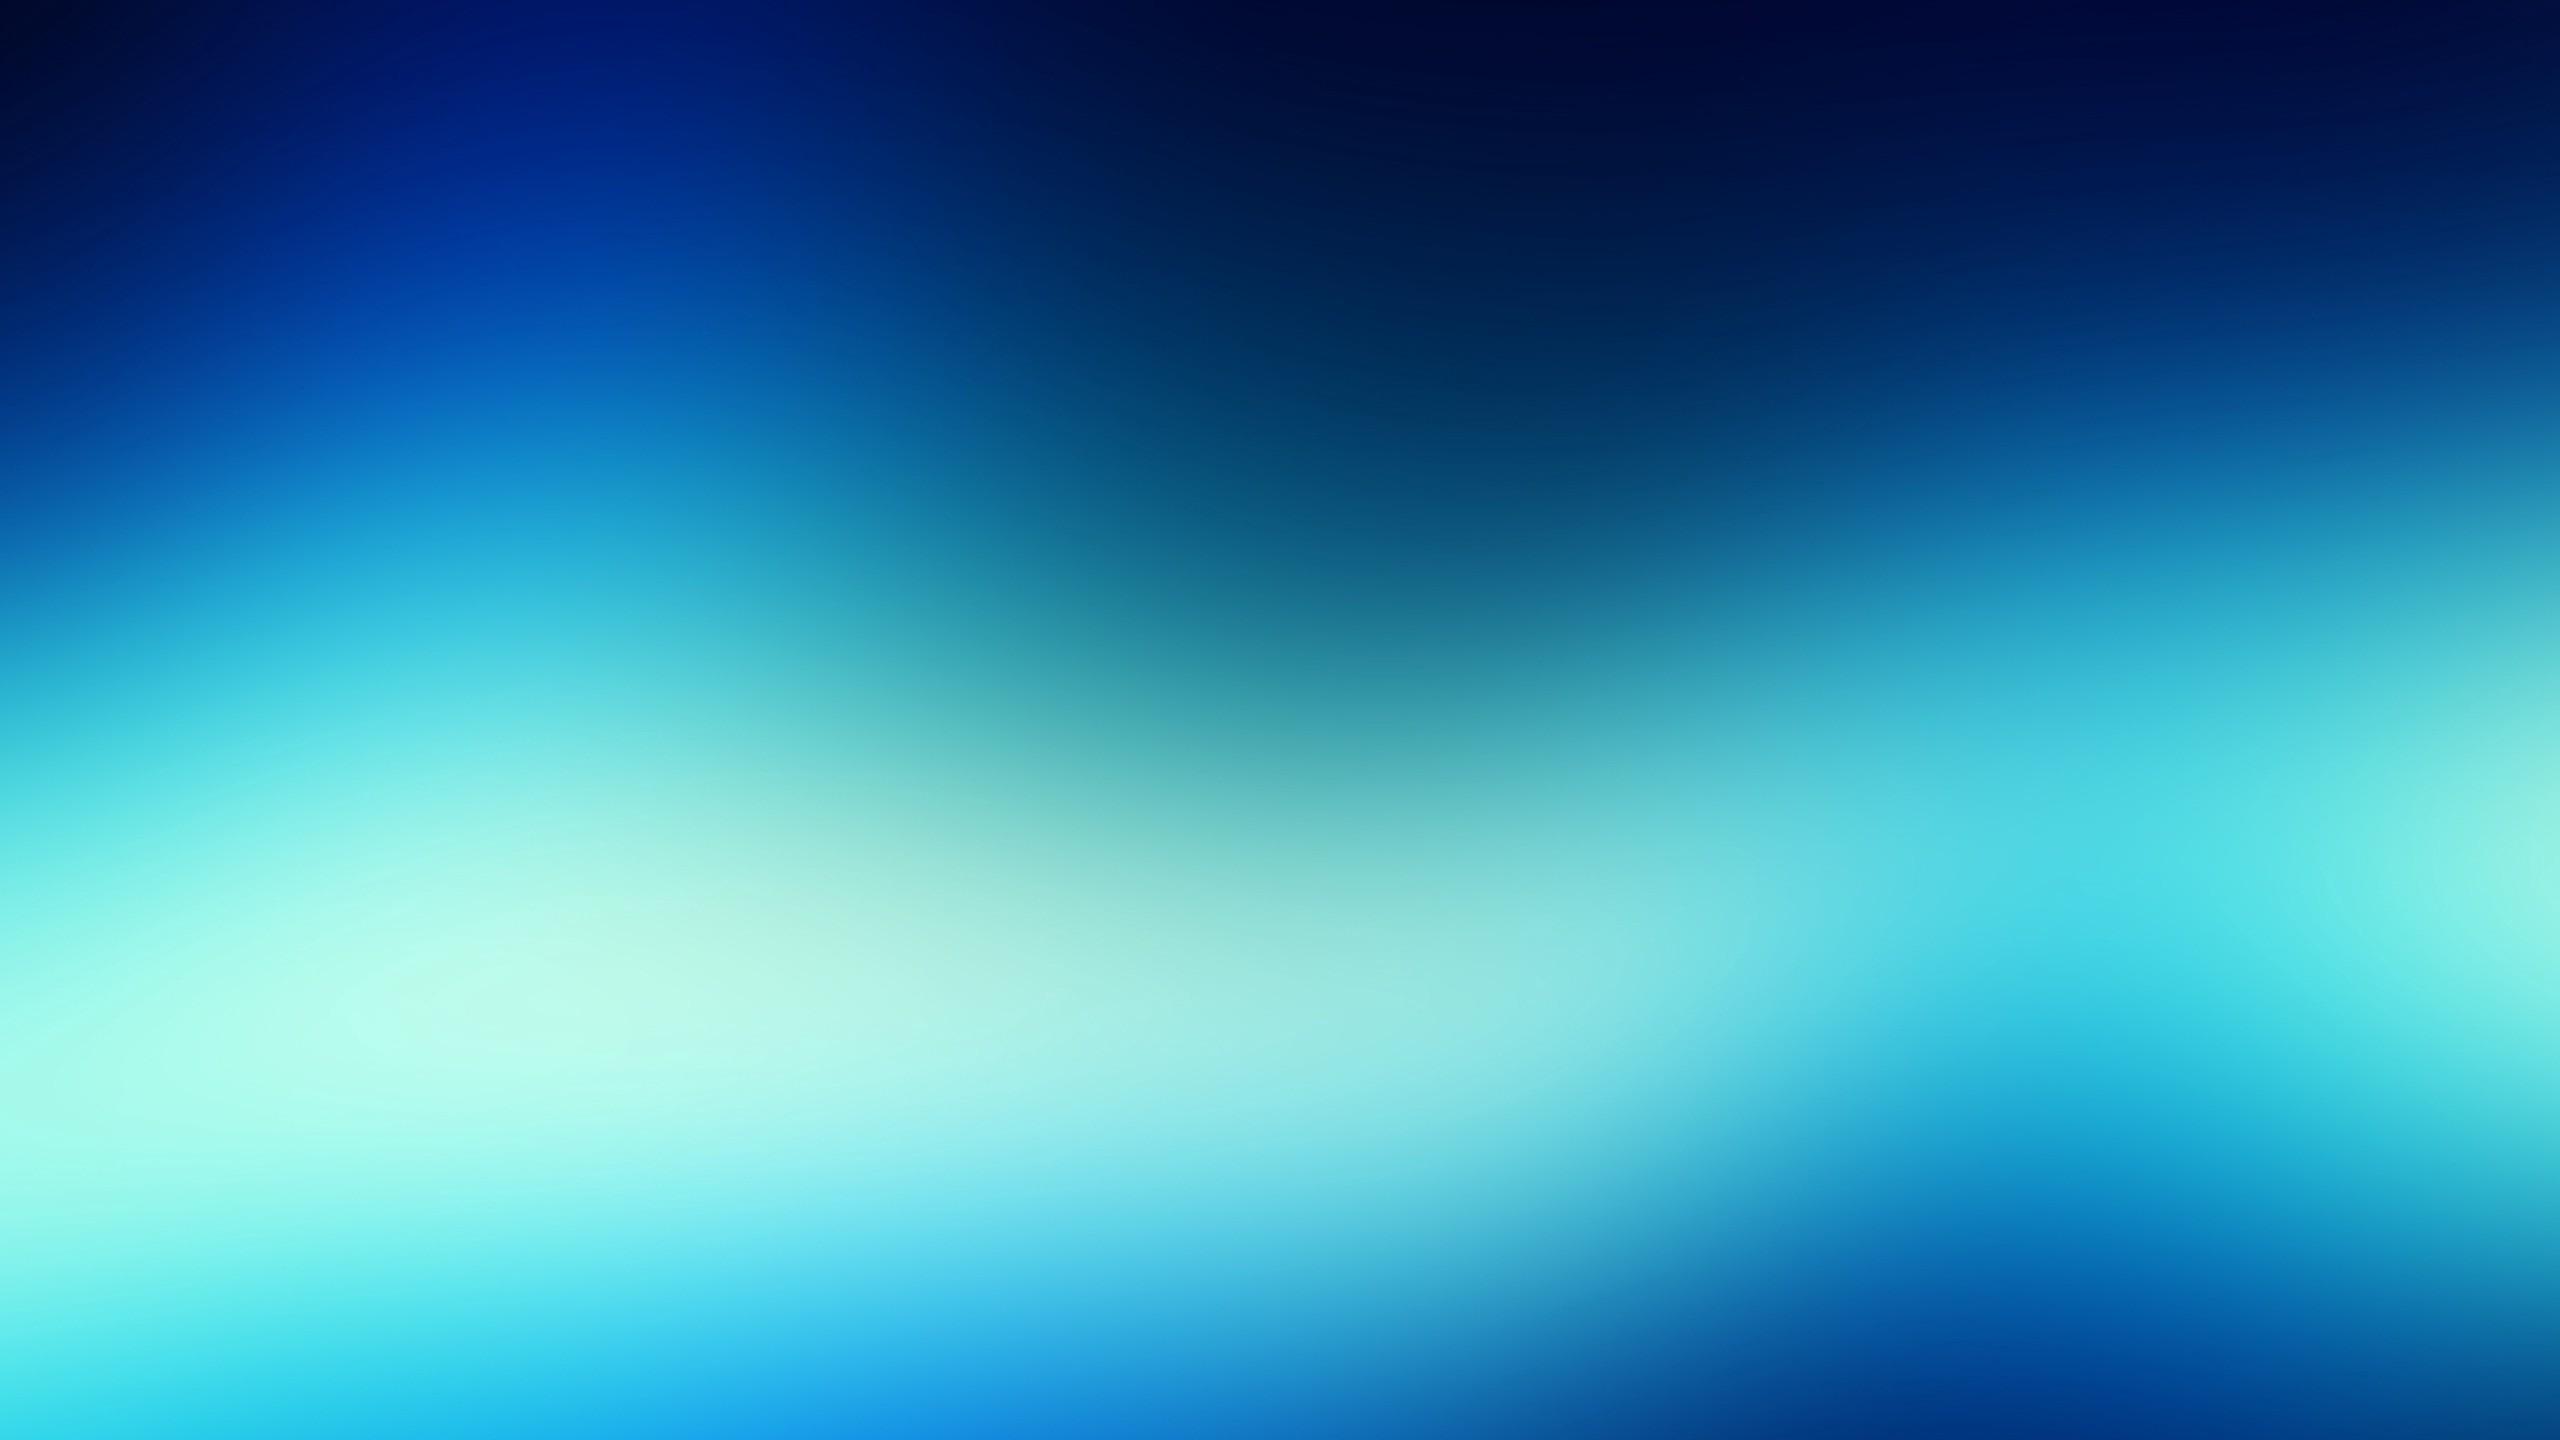 Res: 2560x1440,  Wallpaper texture, spots, lines, blue background